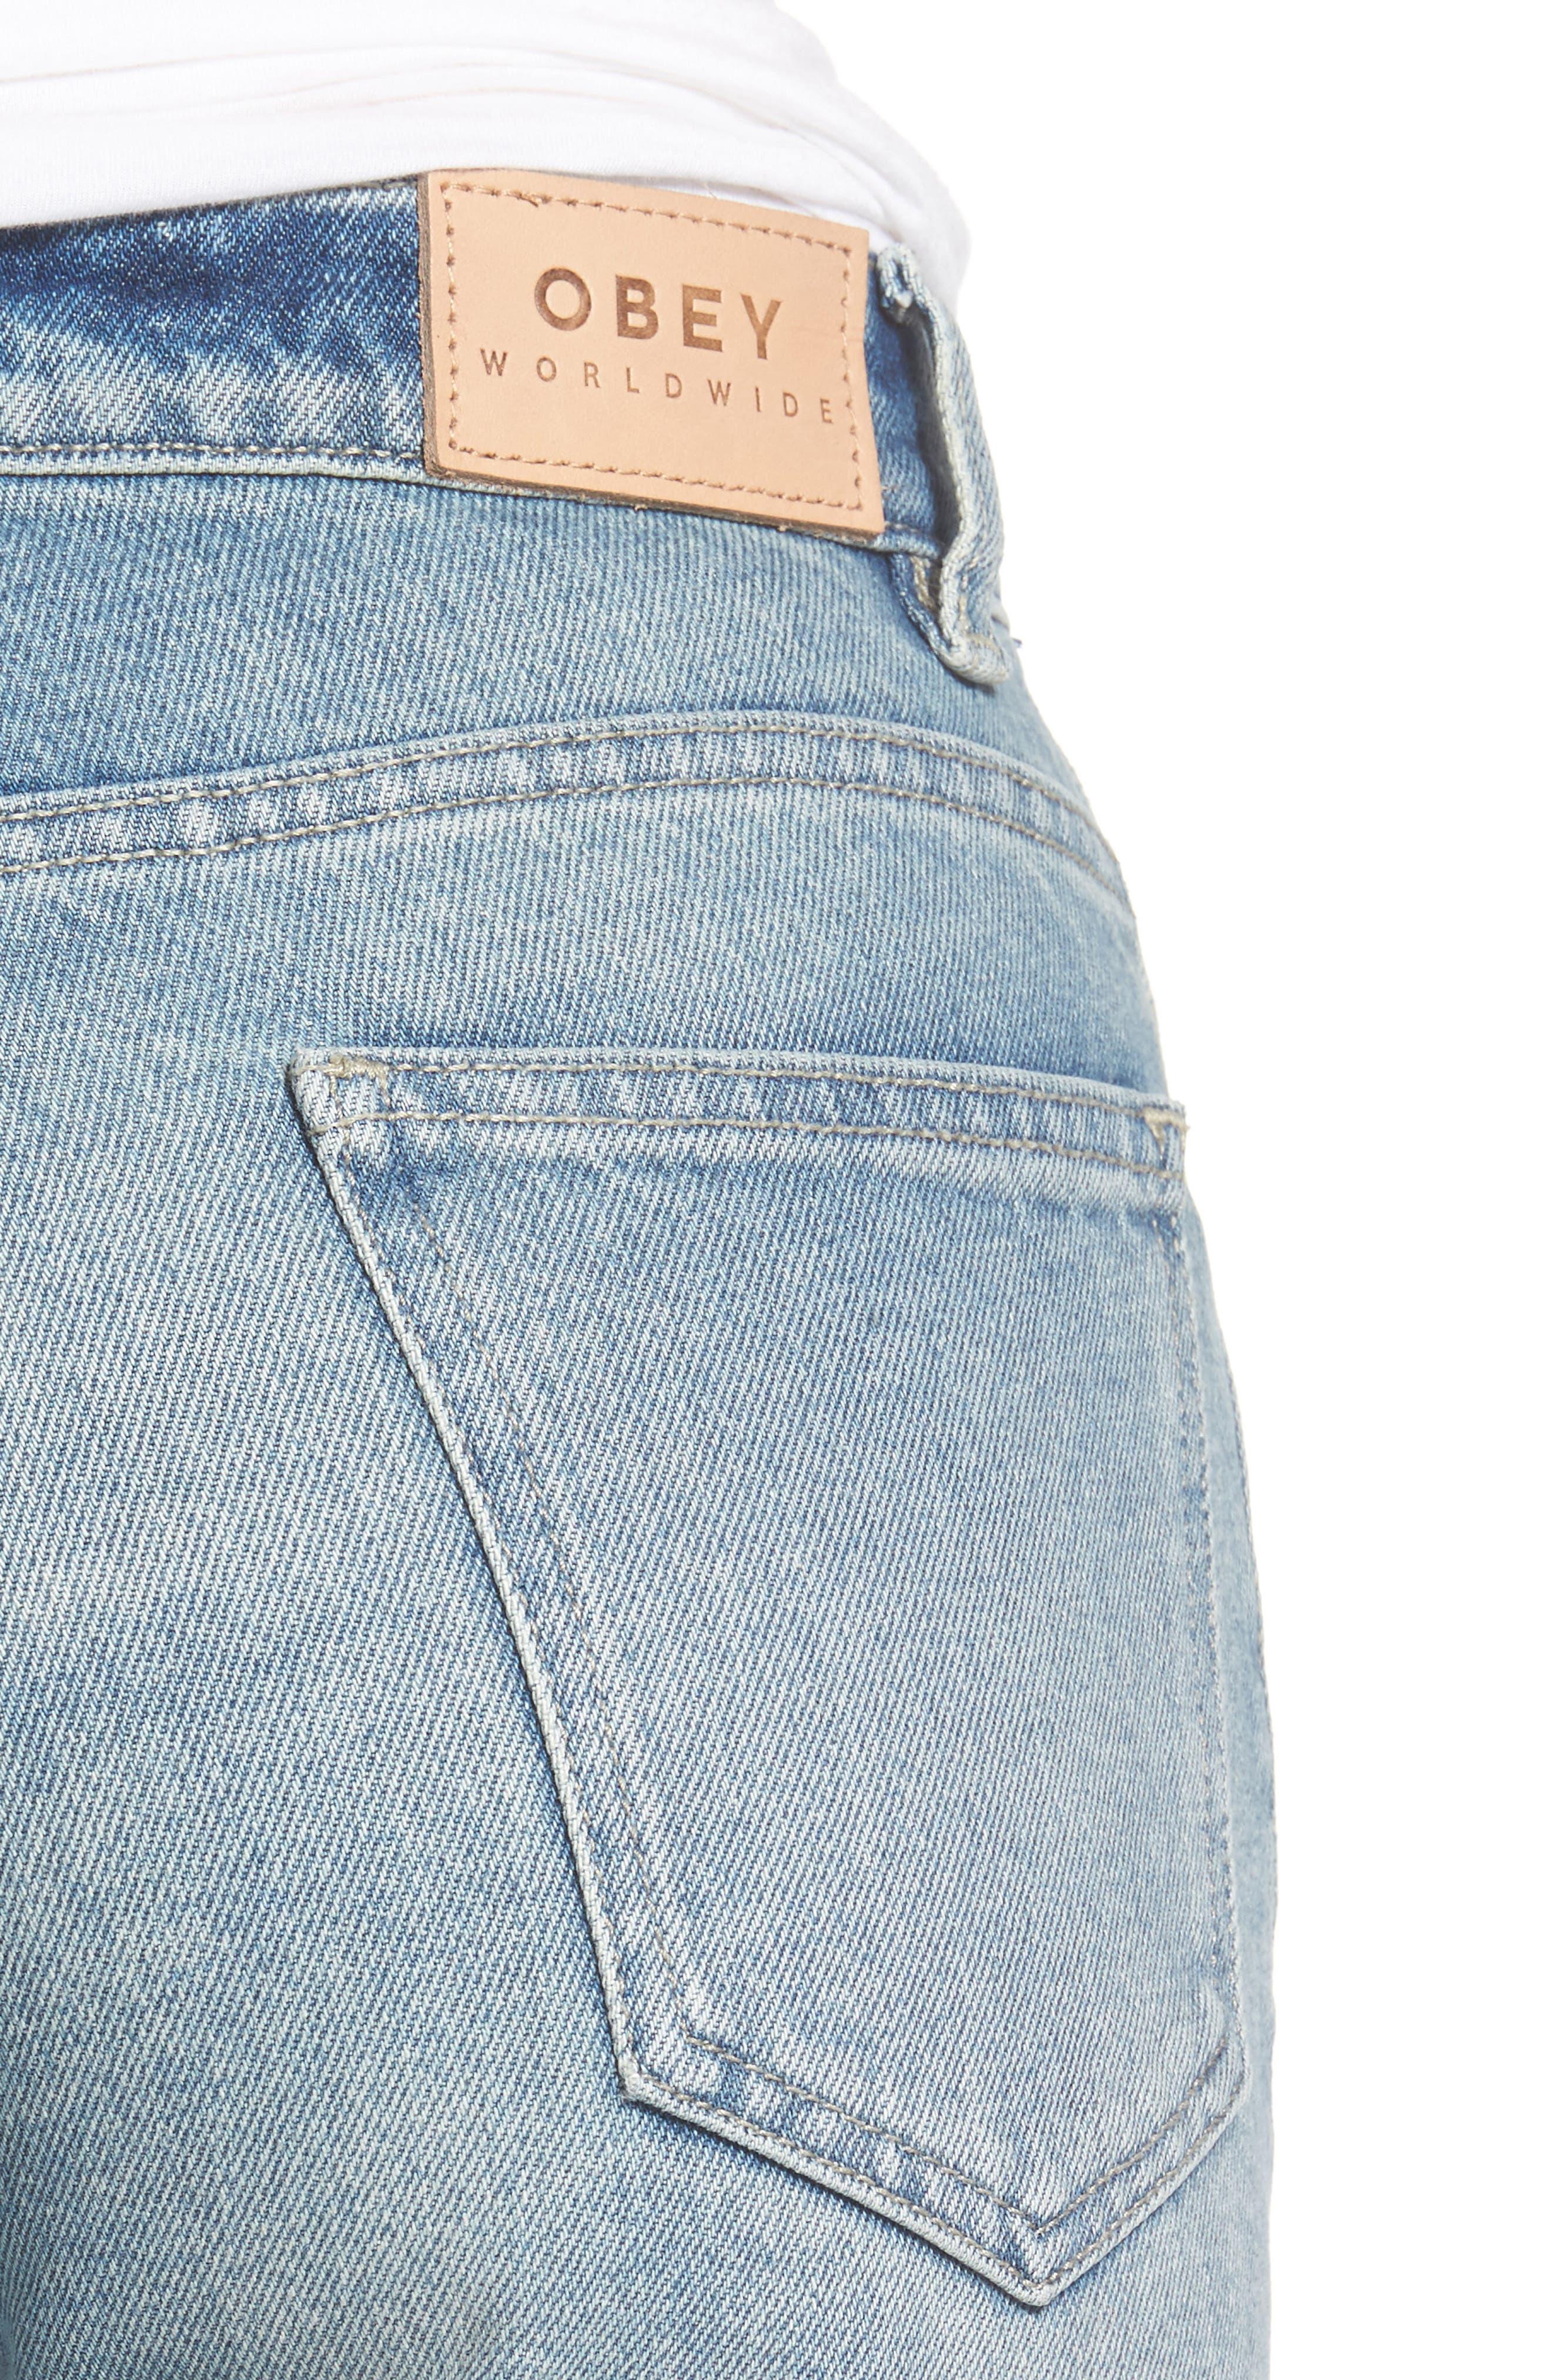 Sundays Straggler High Waist Jeans,                             Alternate thumbnail 4, color,                             Bleached Indigo